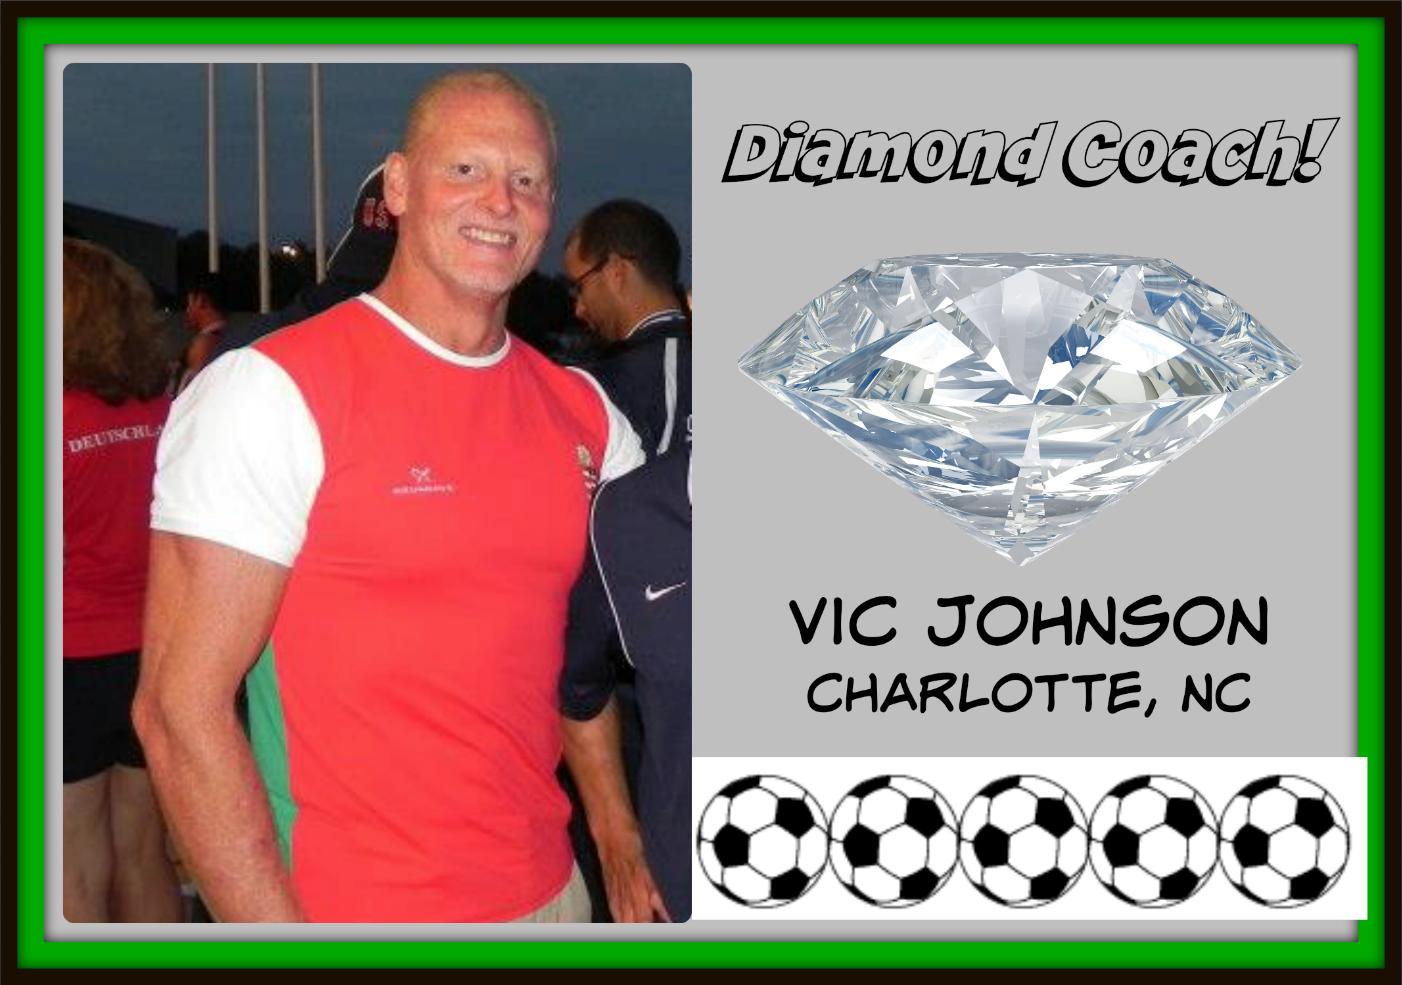 Vic Johnson